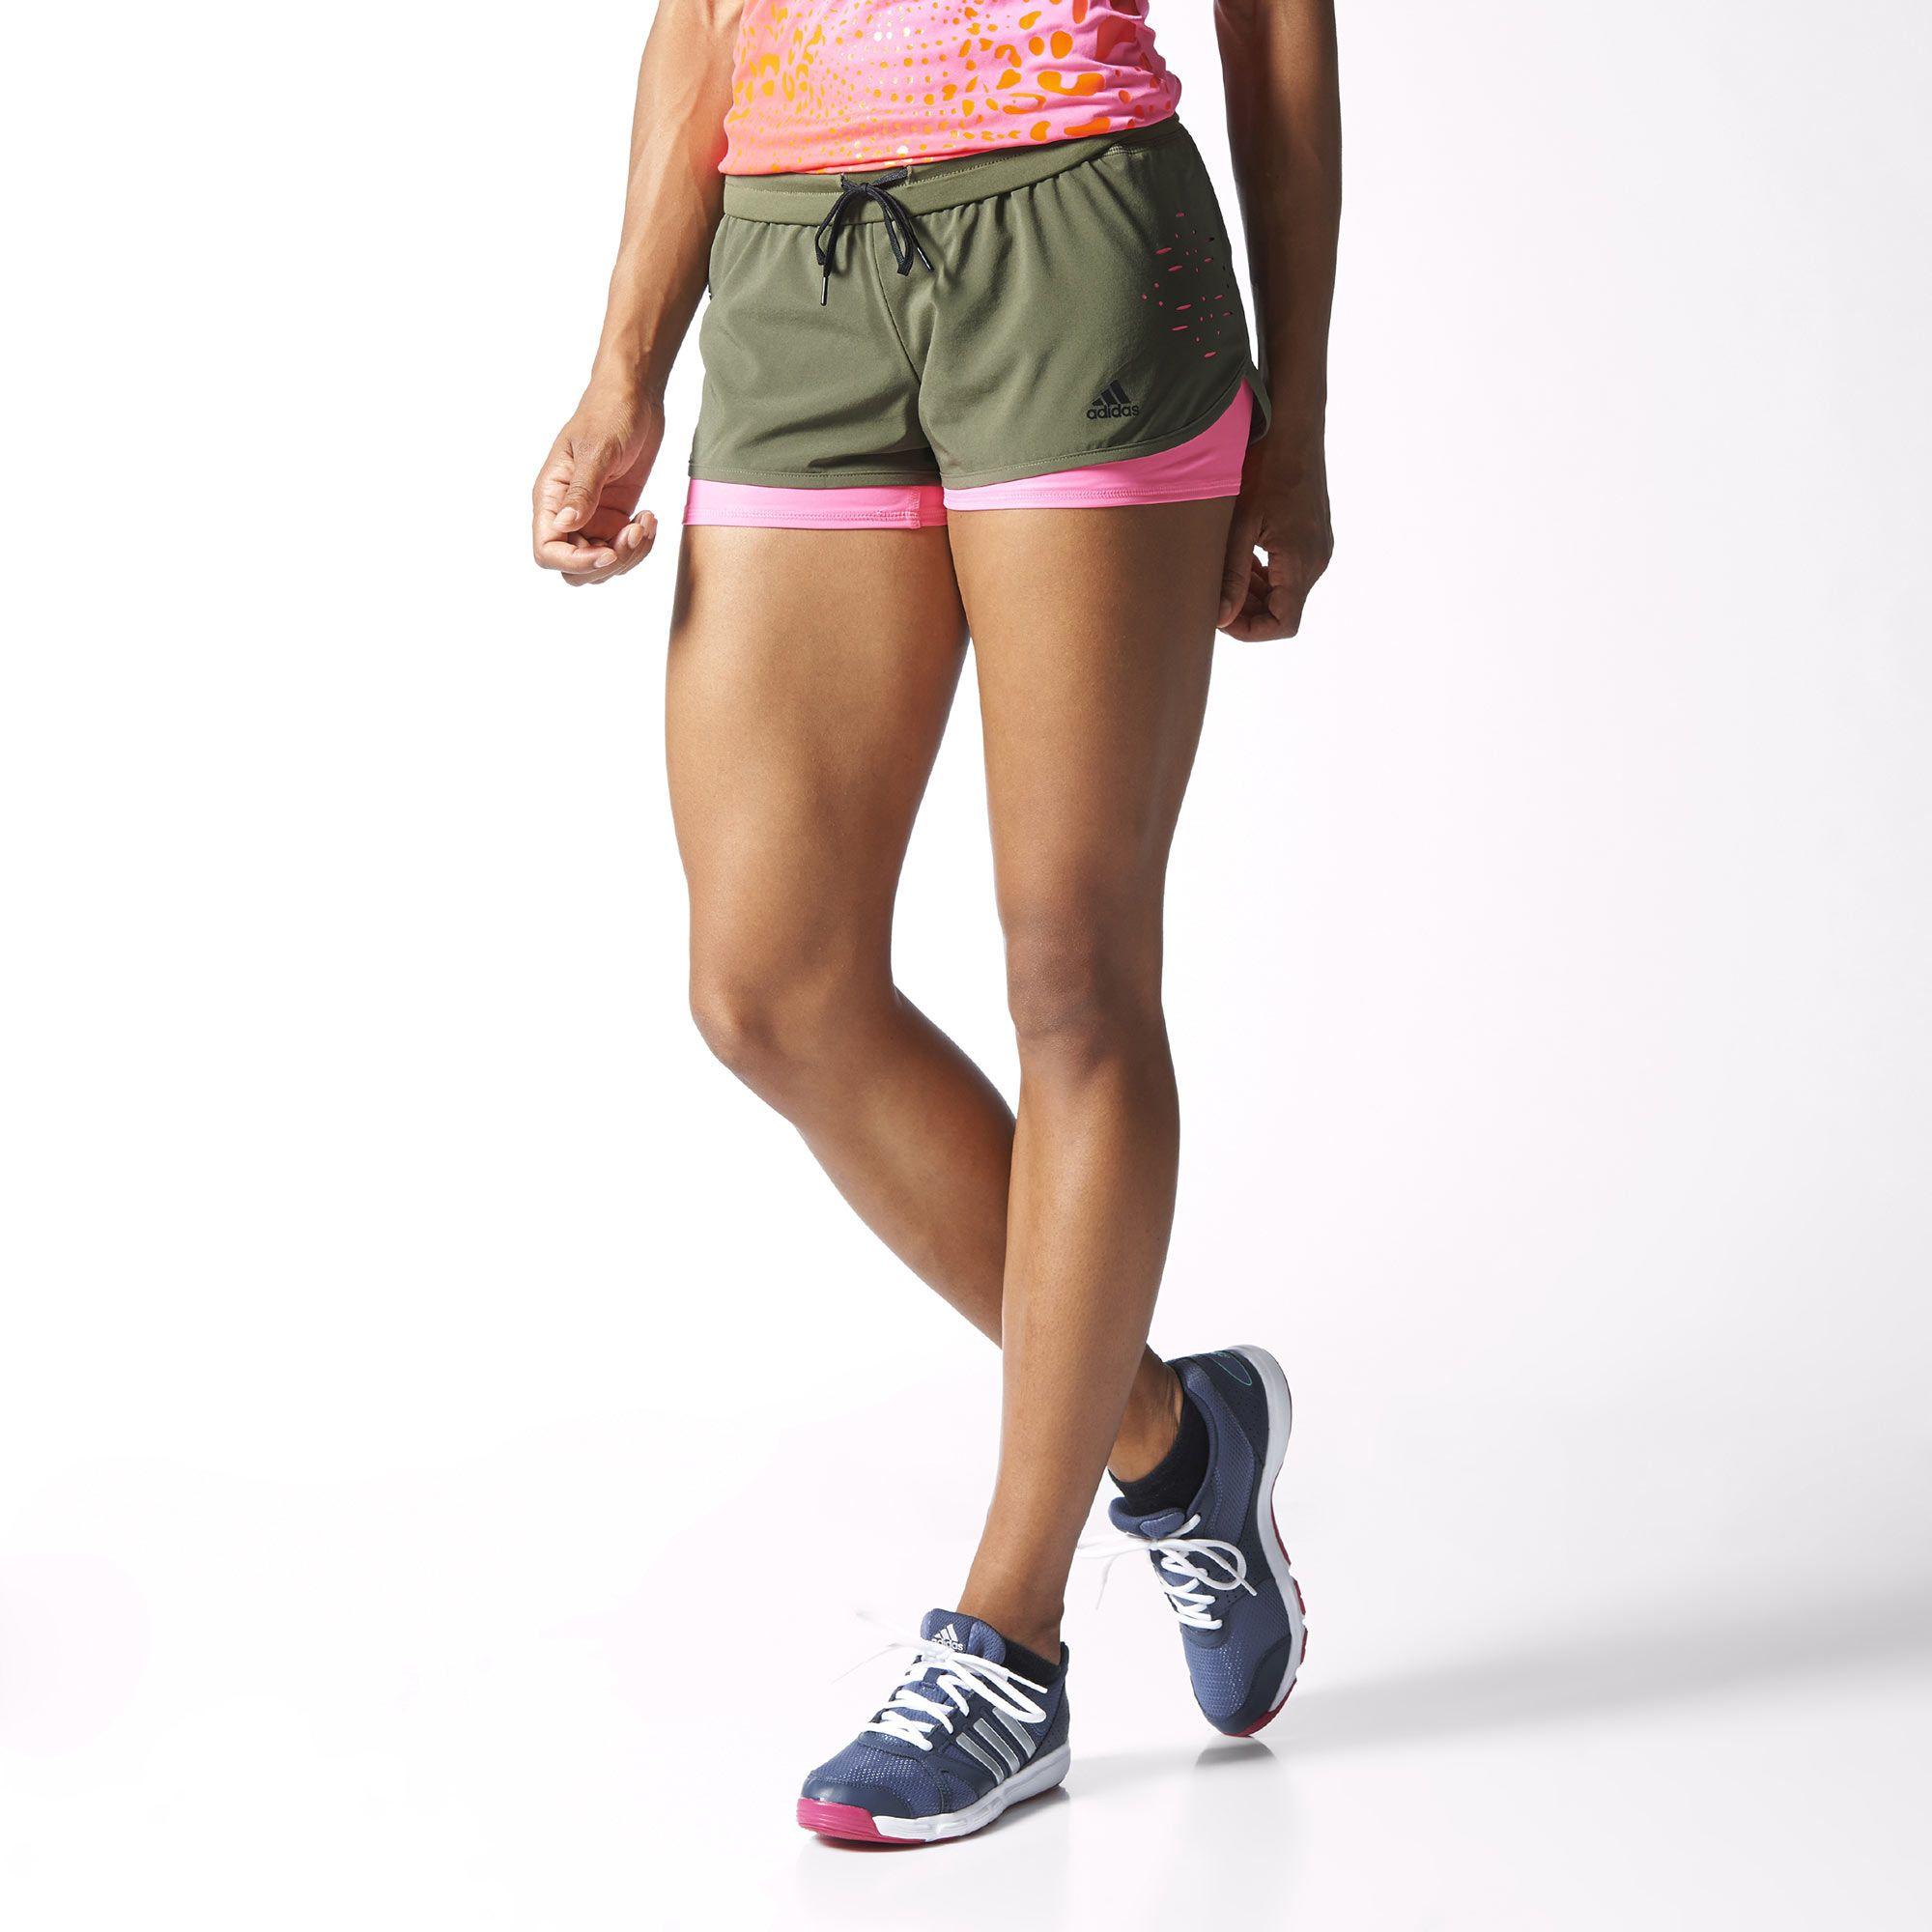 fertilizante Tomar conciencia champú  adidas Studio Power Shorts | adidas Deutschland | Gym shorts womens, Adidas  shorts, Adidas online